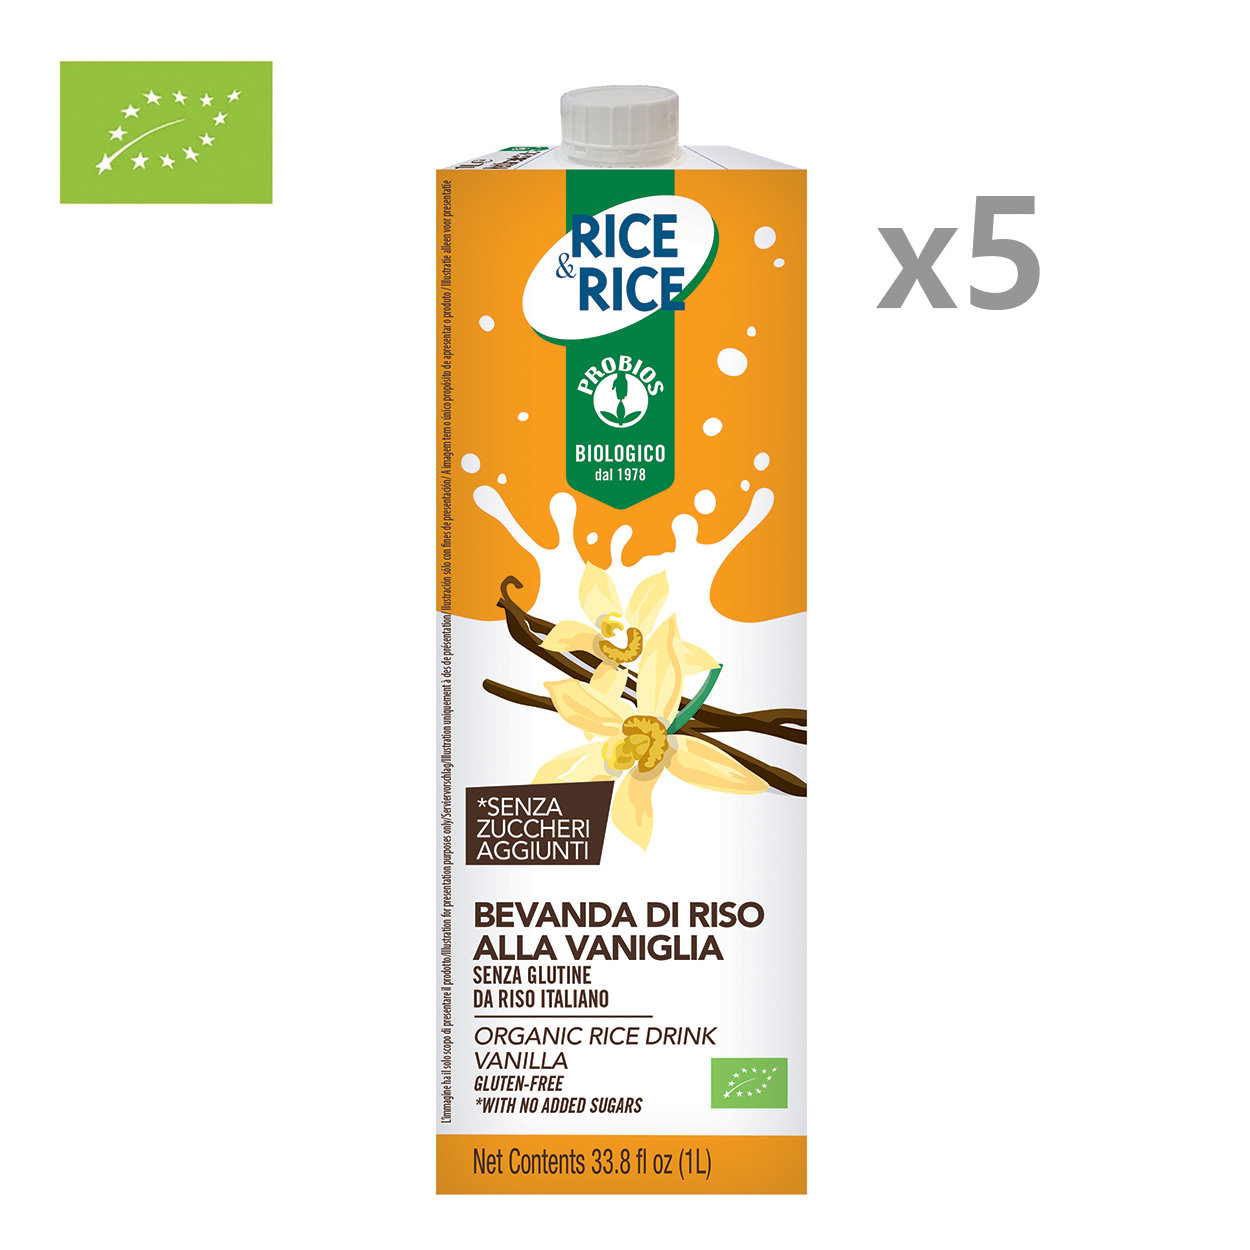 5 brik da 1 lt - Bevanda di Riso alla Vaniglia